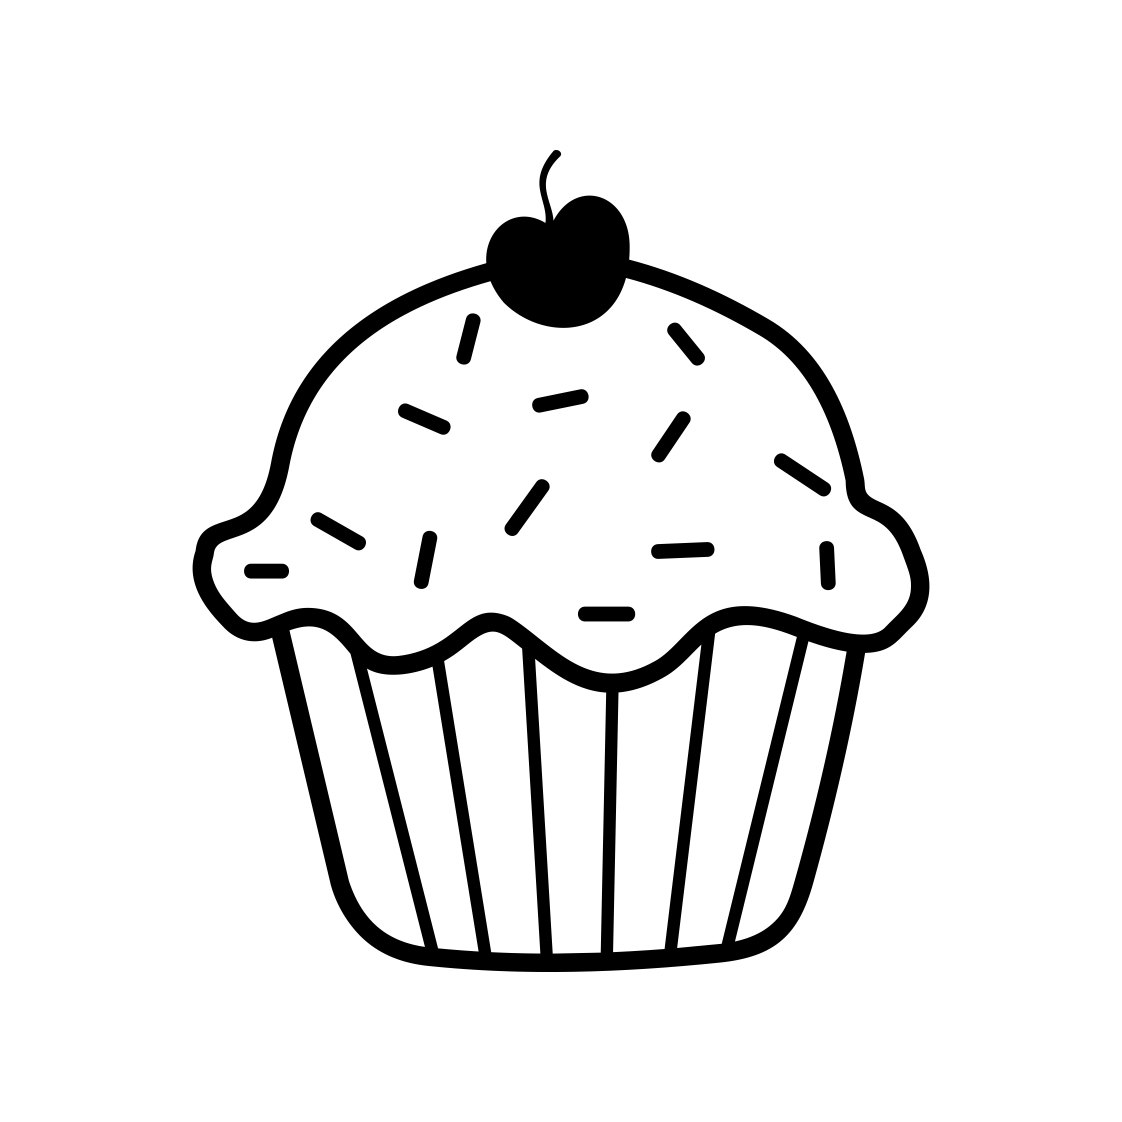 Cherry Cupcake Cute Bake Party Birthday